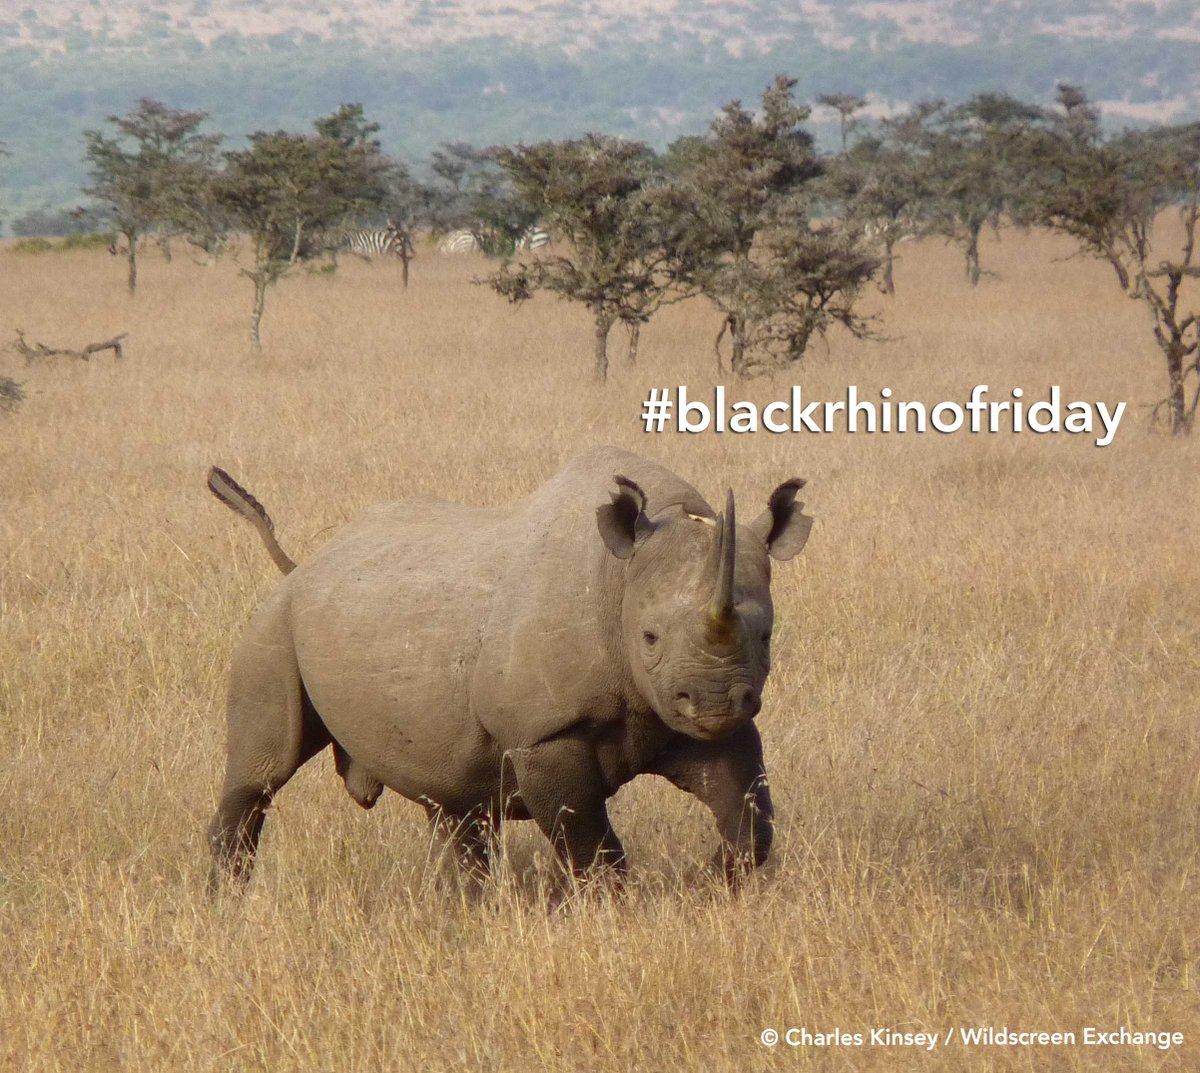 #ff #blackrhinofriday @savetherhino @RhinosIRF @I_love_rhinos @HelpingRhinos  @TeamRhinoUK @AntiPoach https://t.co/oT76abQUSZ